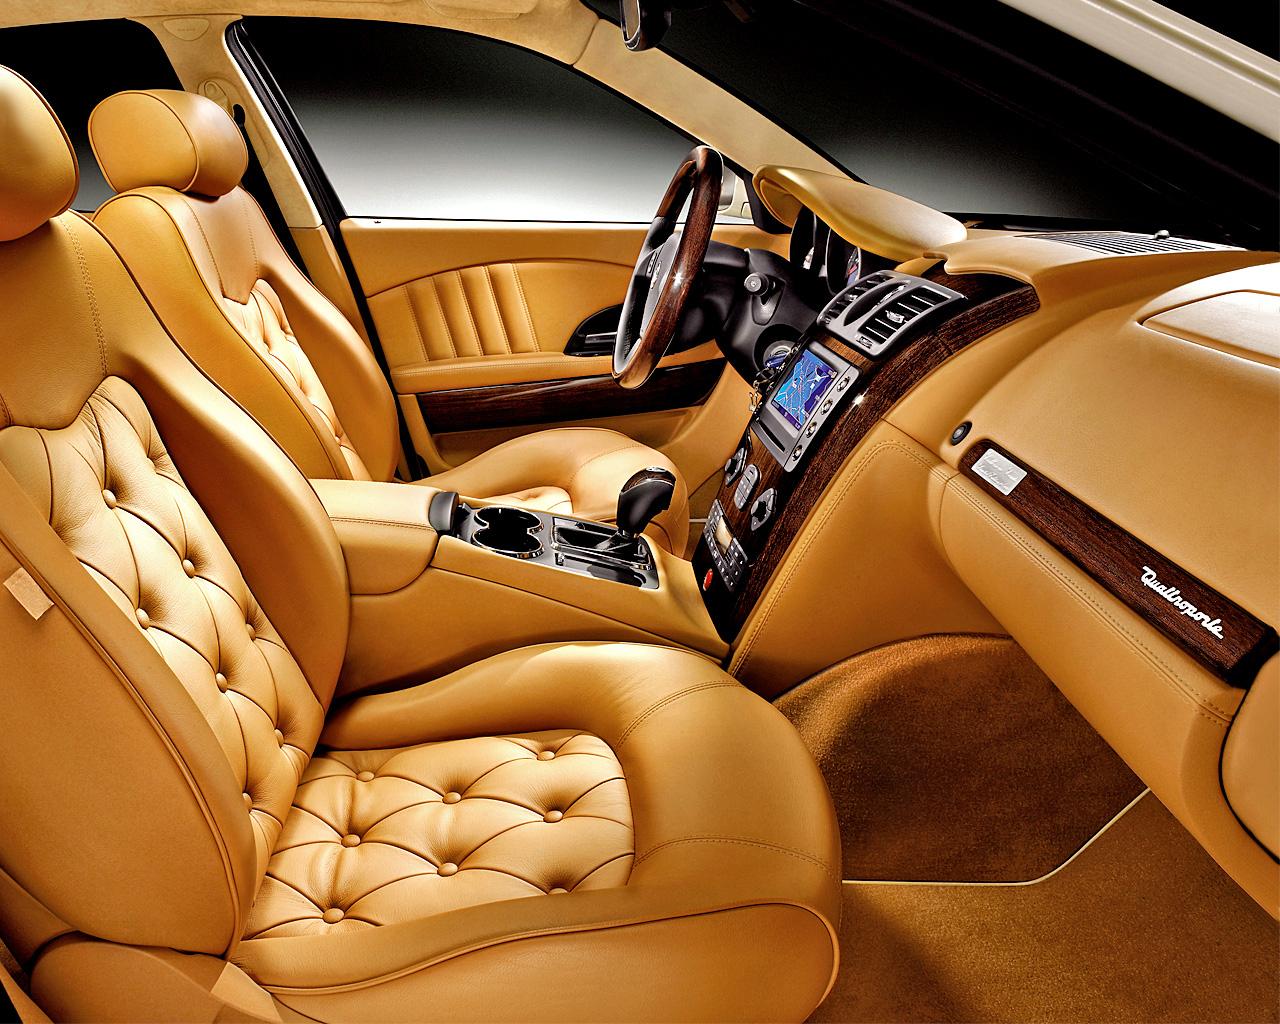 Дизайн салона автомобиля